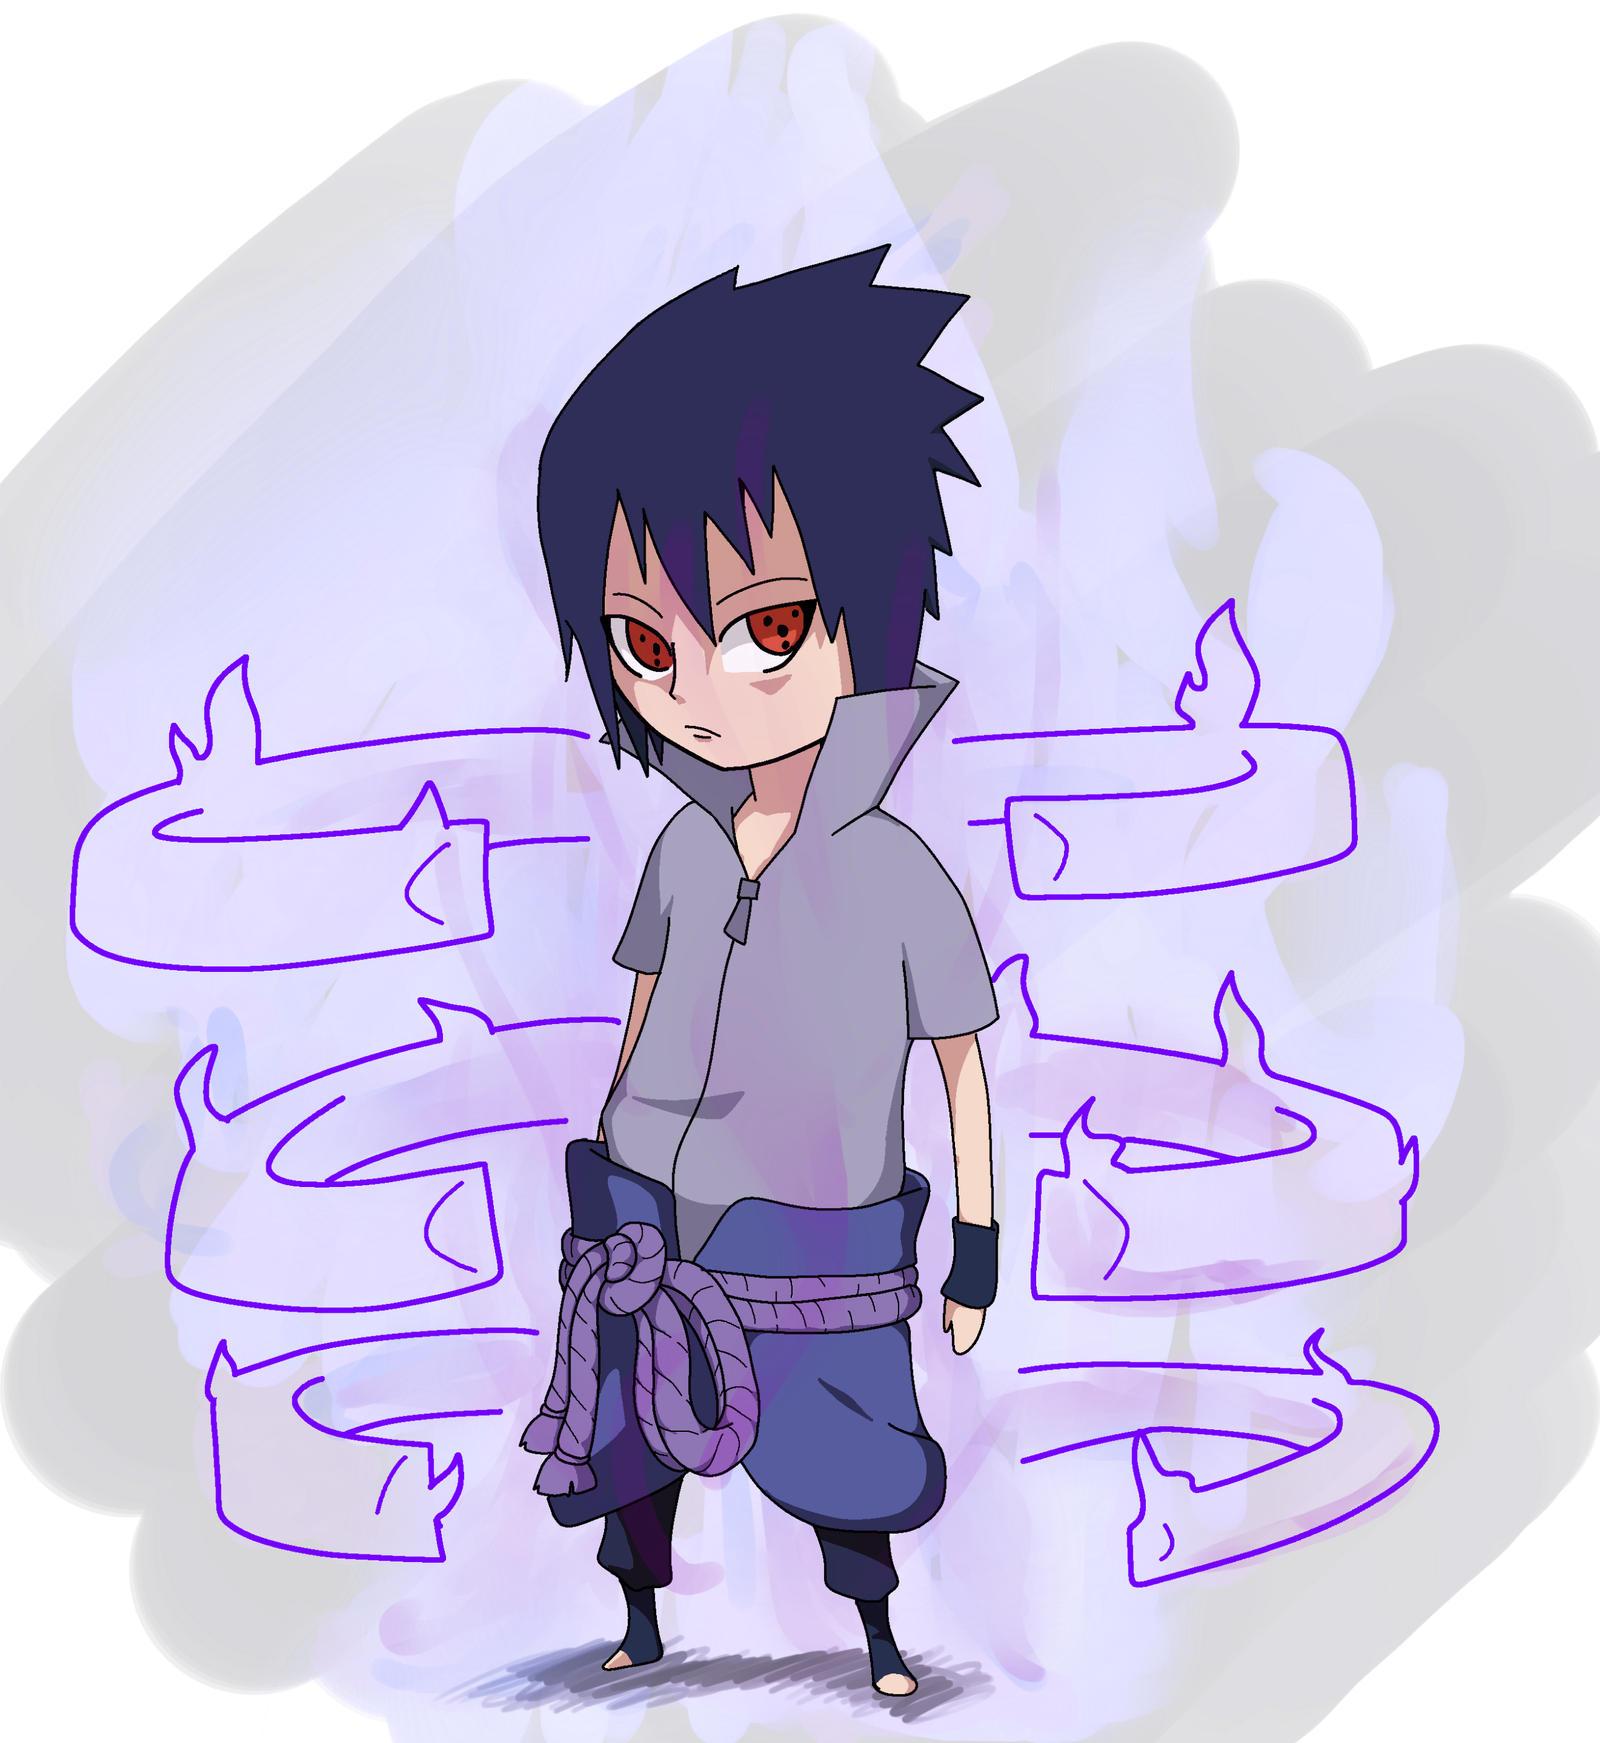 Chibi Sasuke Susanoo by RonyeryX on DeviantArt